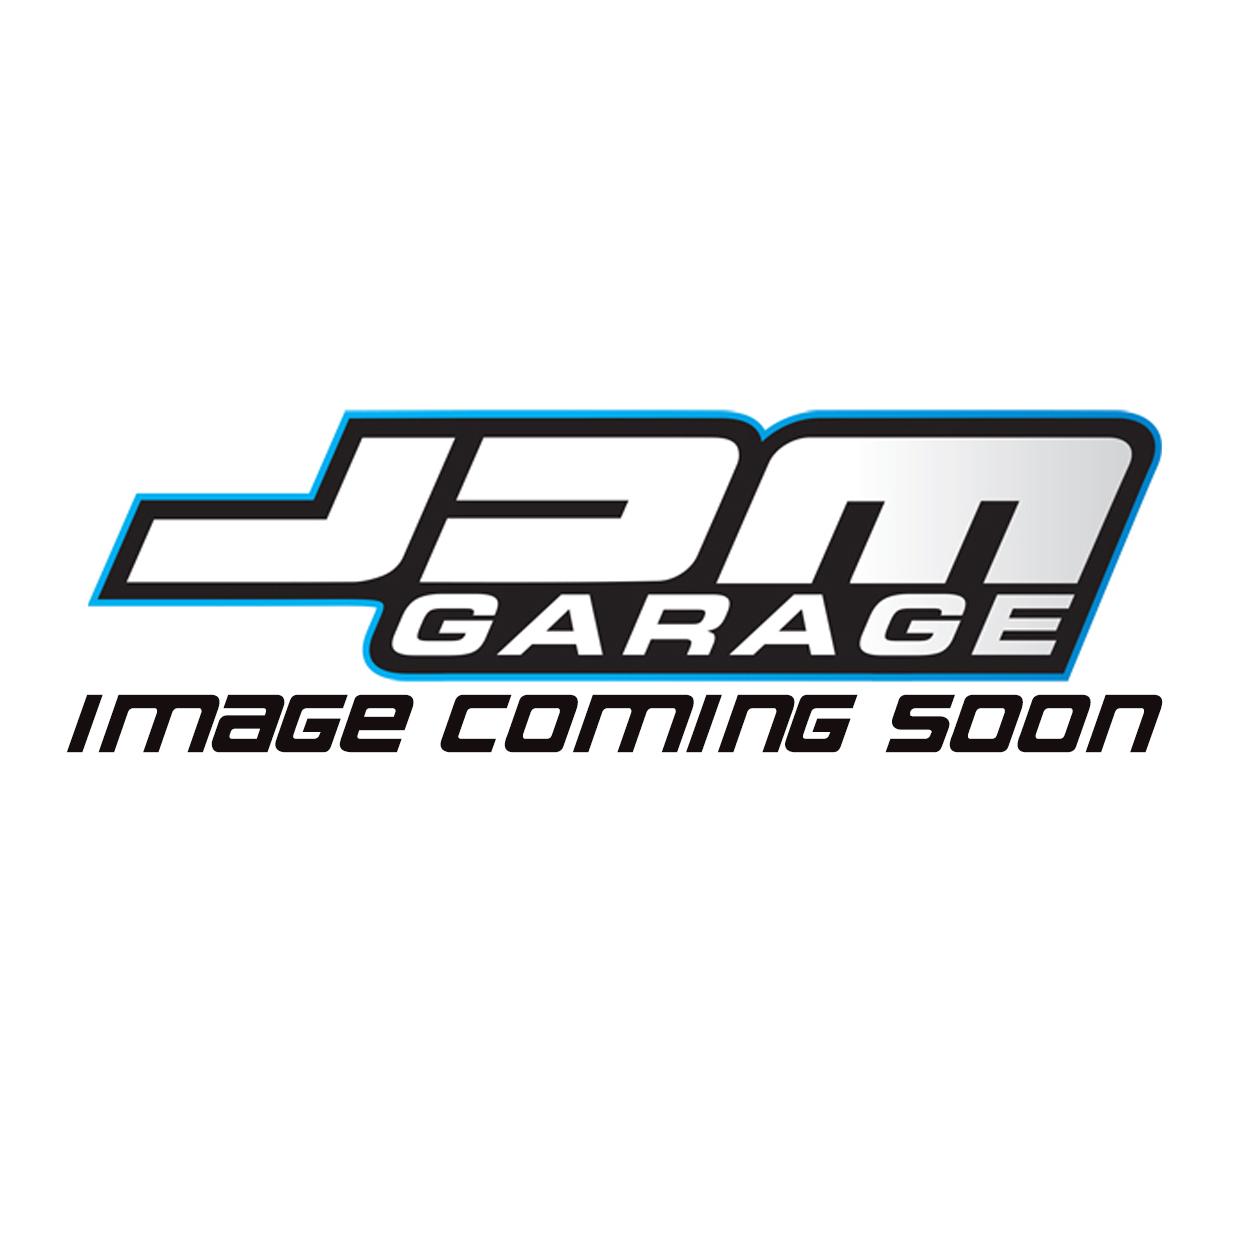 Nissan Genuine OEM Engine Gasket Kit For RB26DETT R32 R33 R34 GTR Skyline 10101-24U28